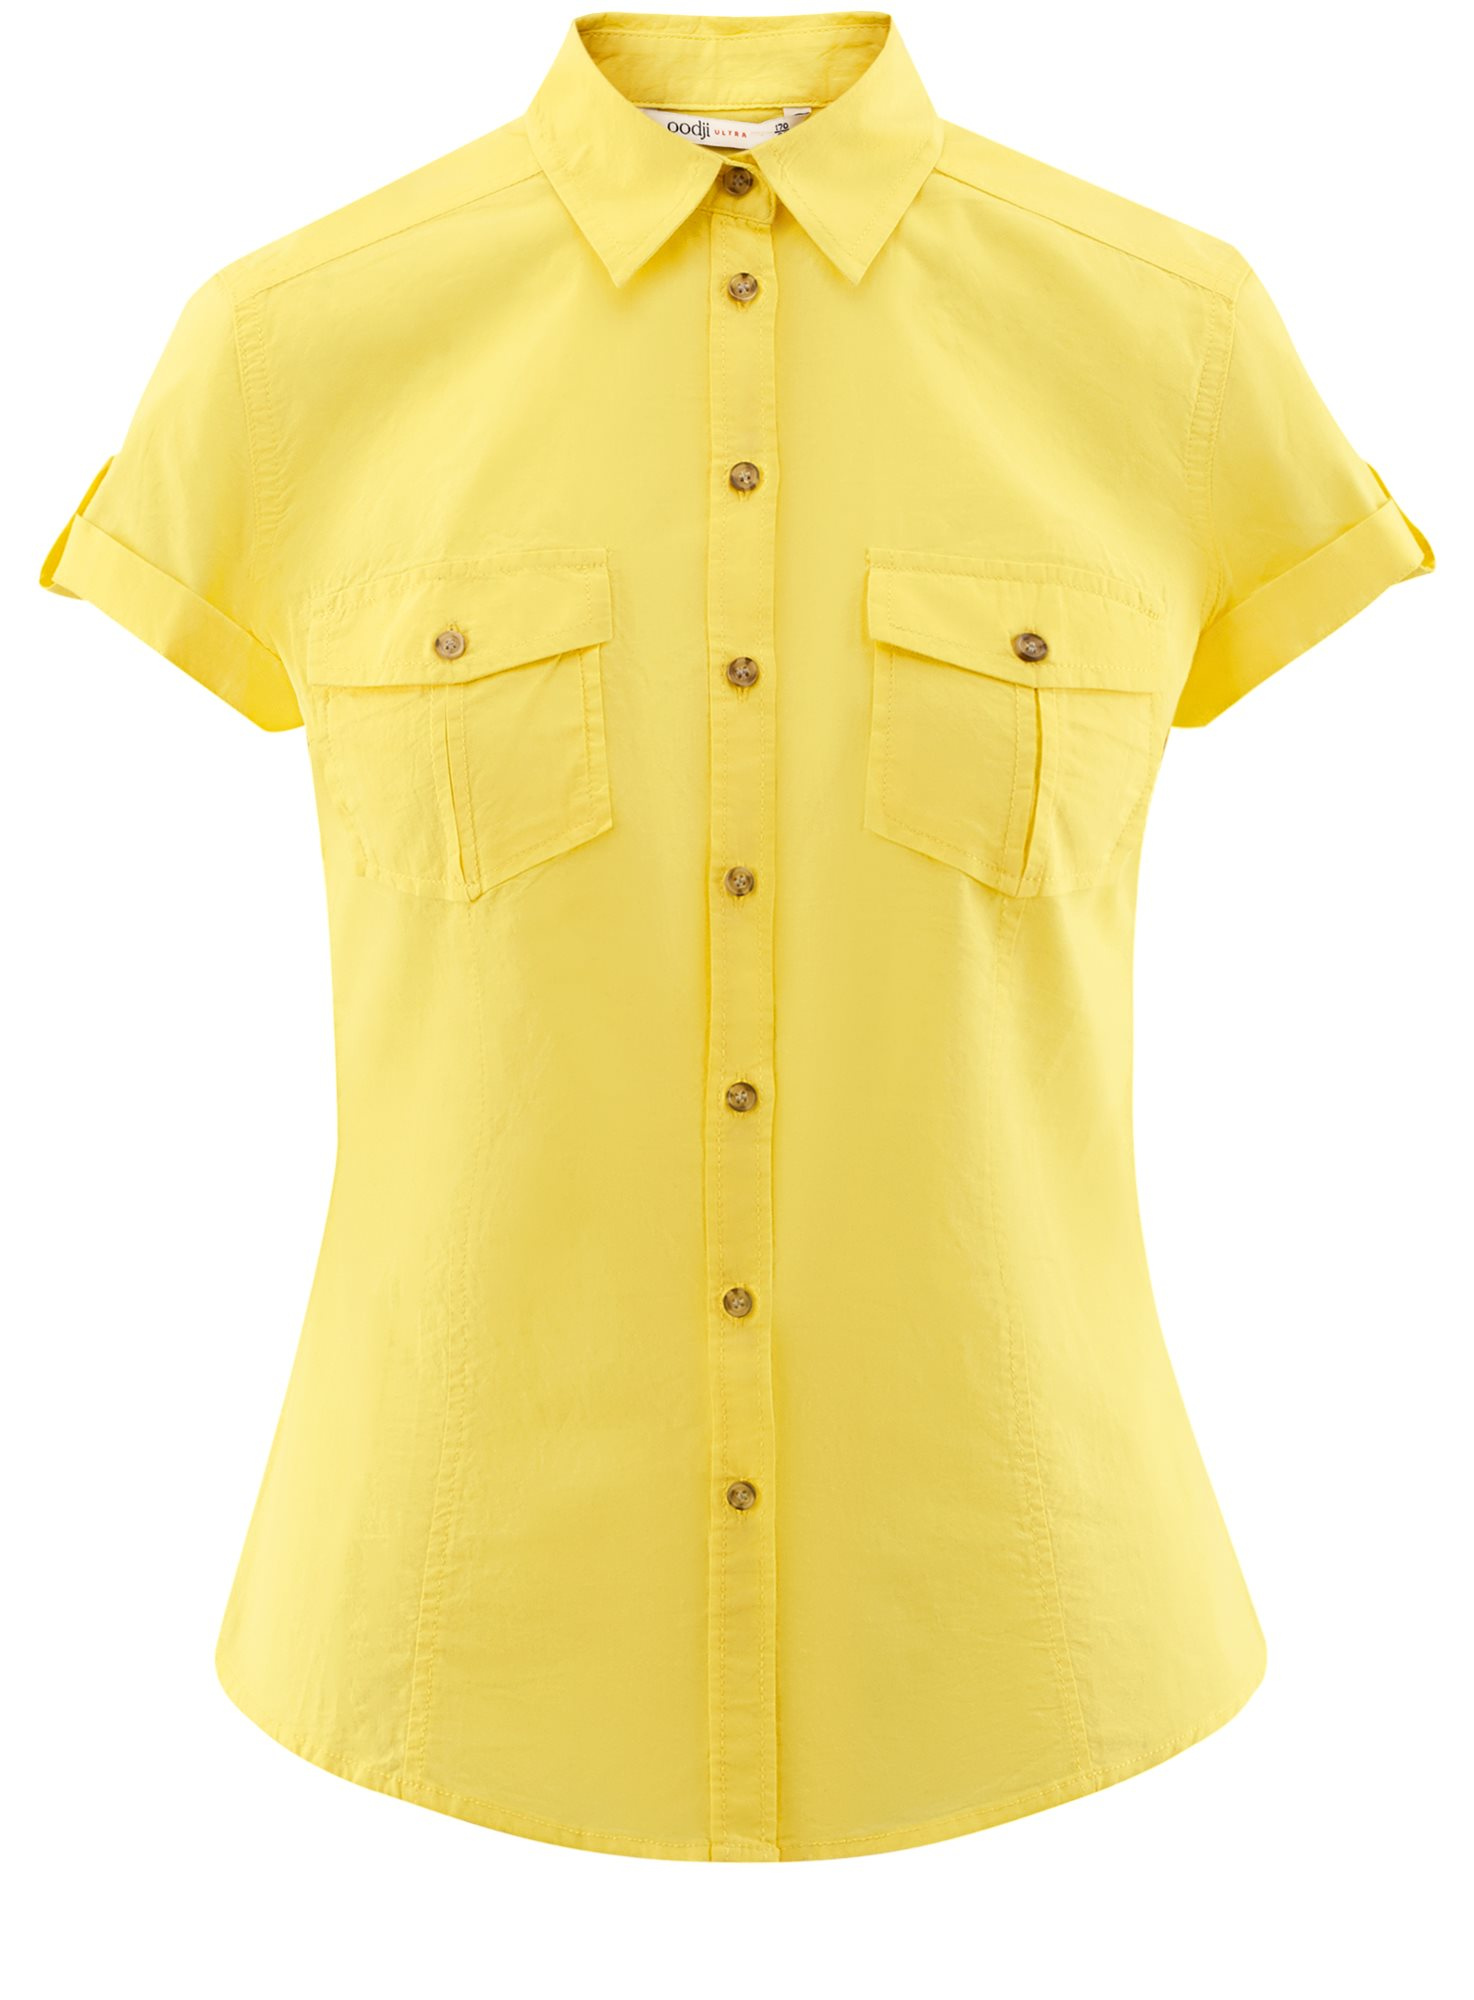 Рубашка базовая с коротким рукавом oodji для женщины (желтый), 11402084-5B/45510/5200N